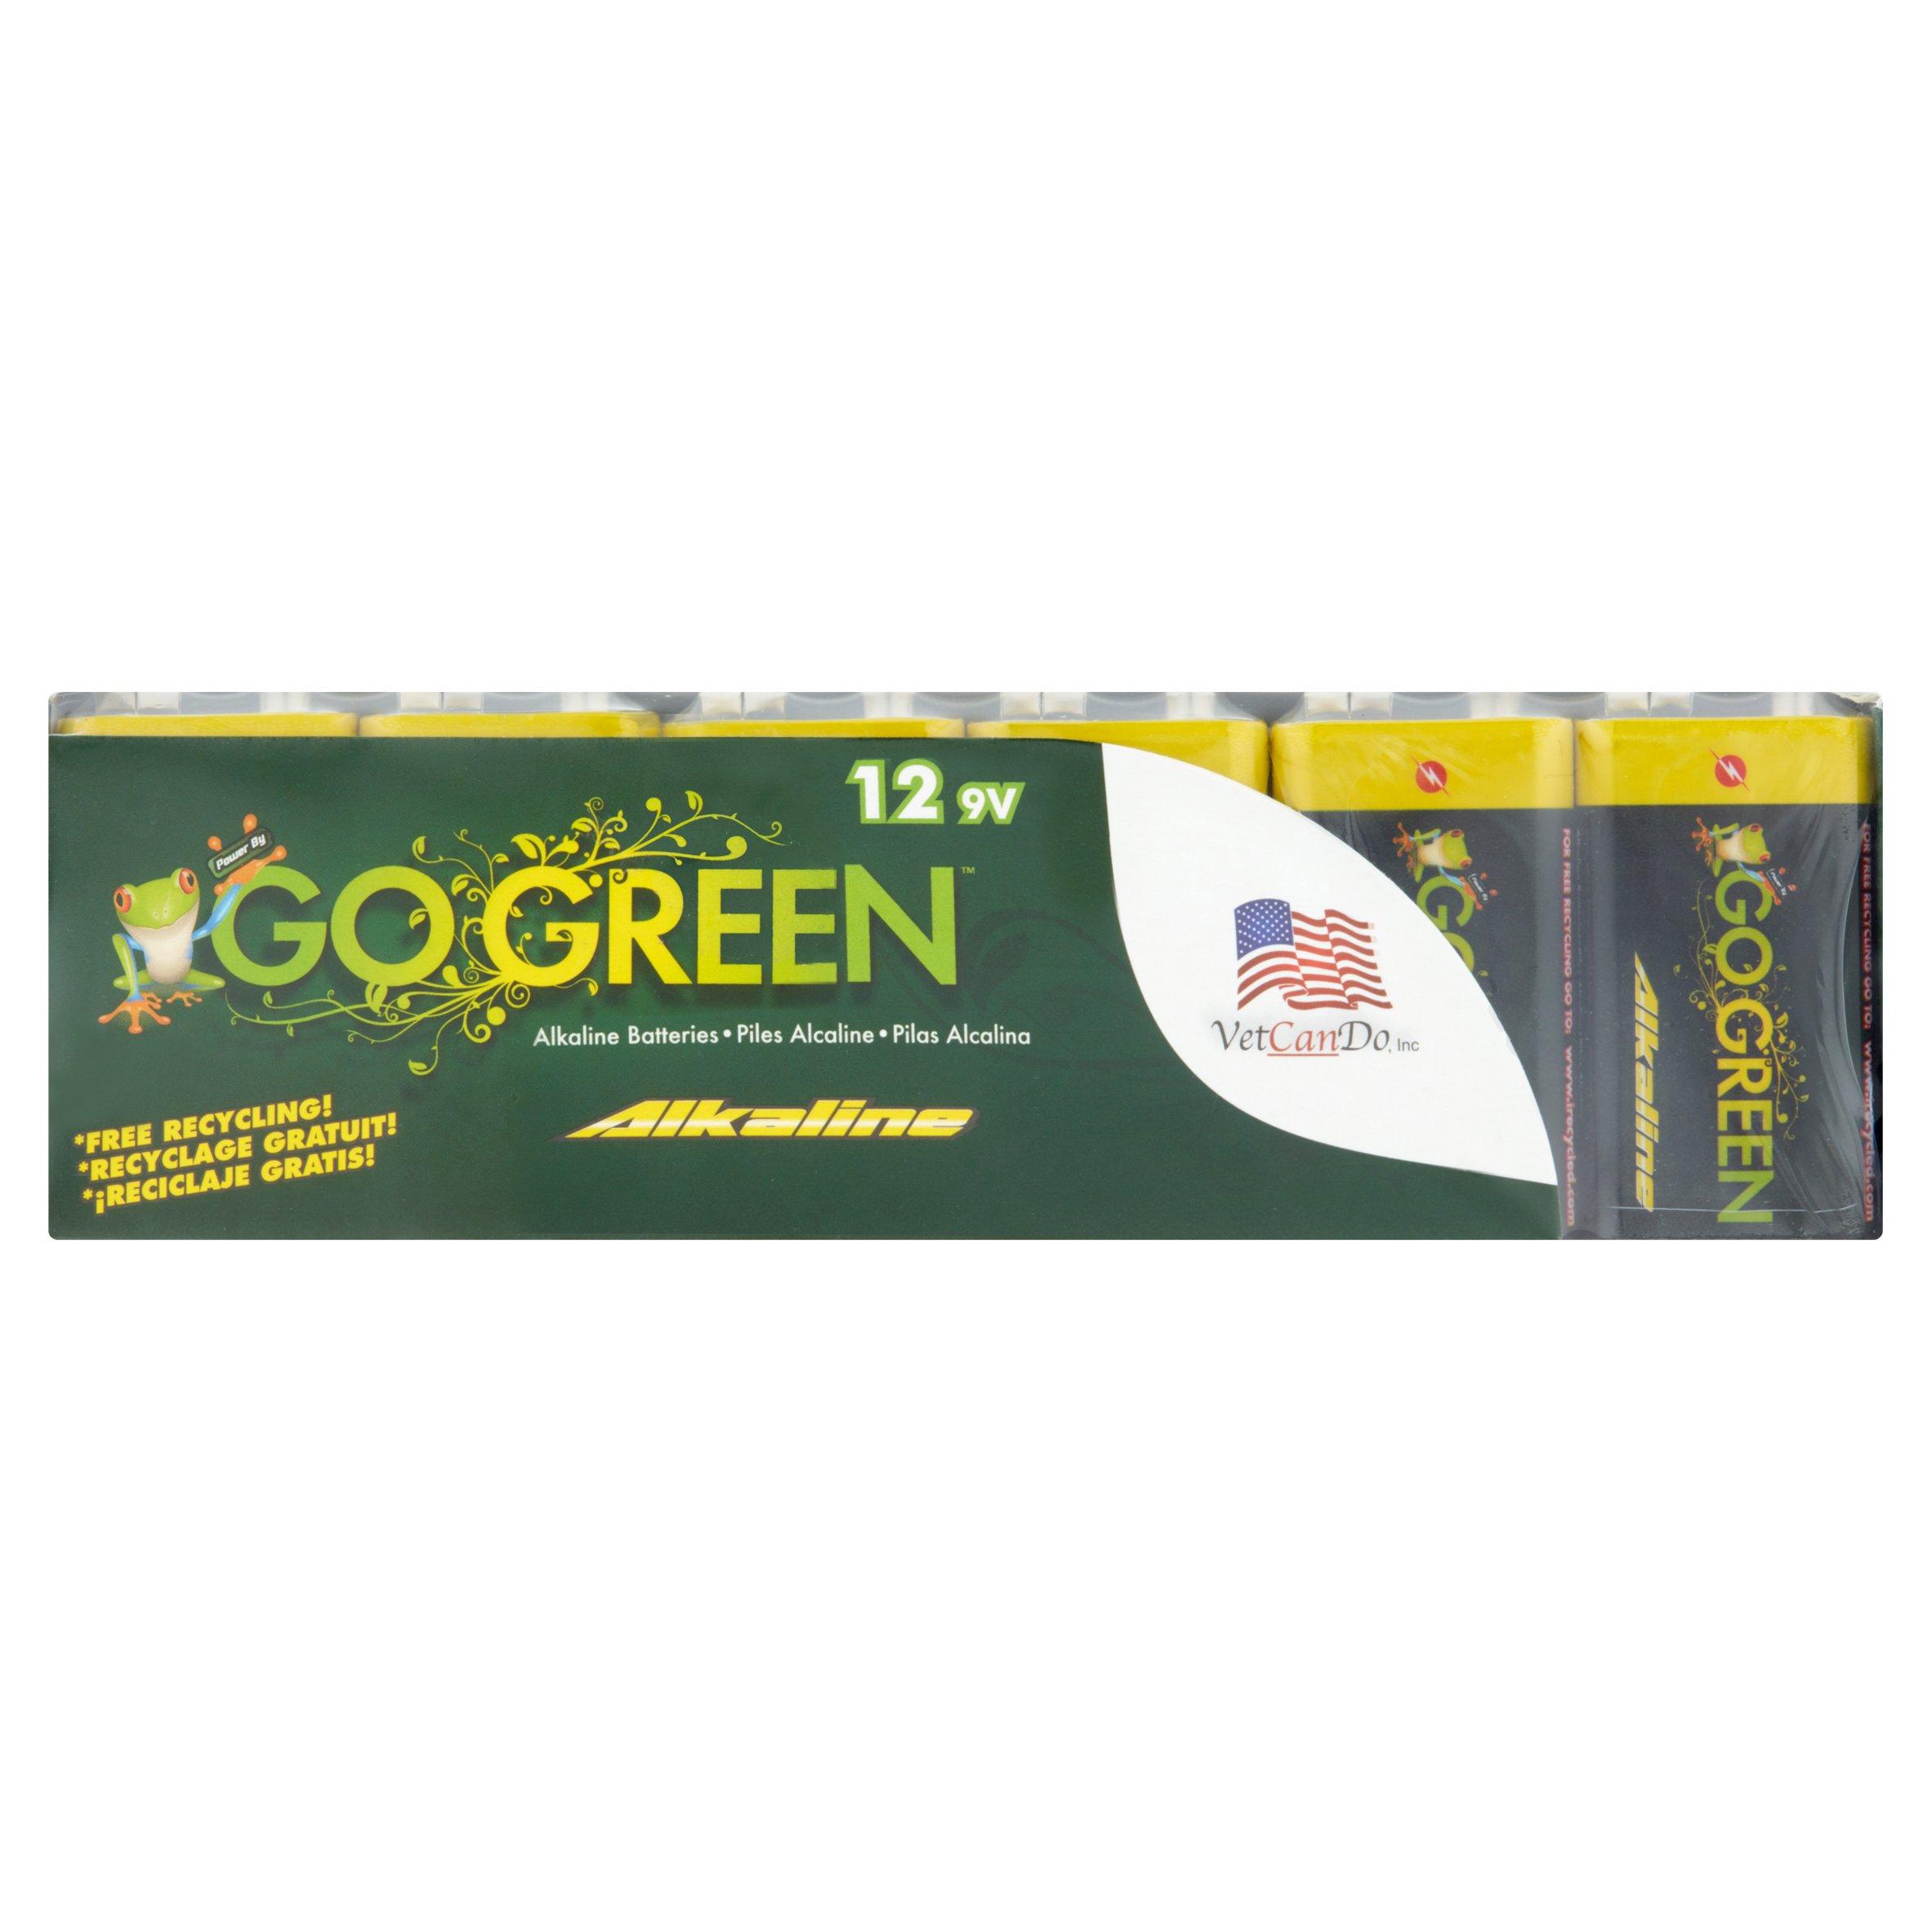 Go Green Alkaline 9V Batteries, 12 Count